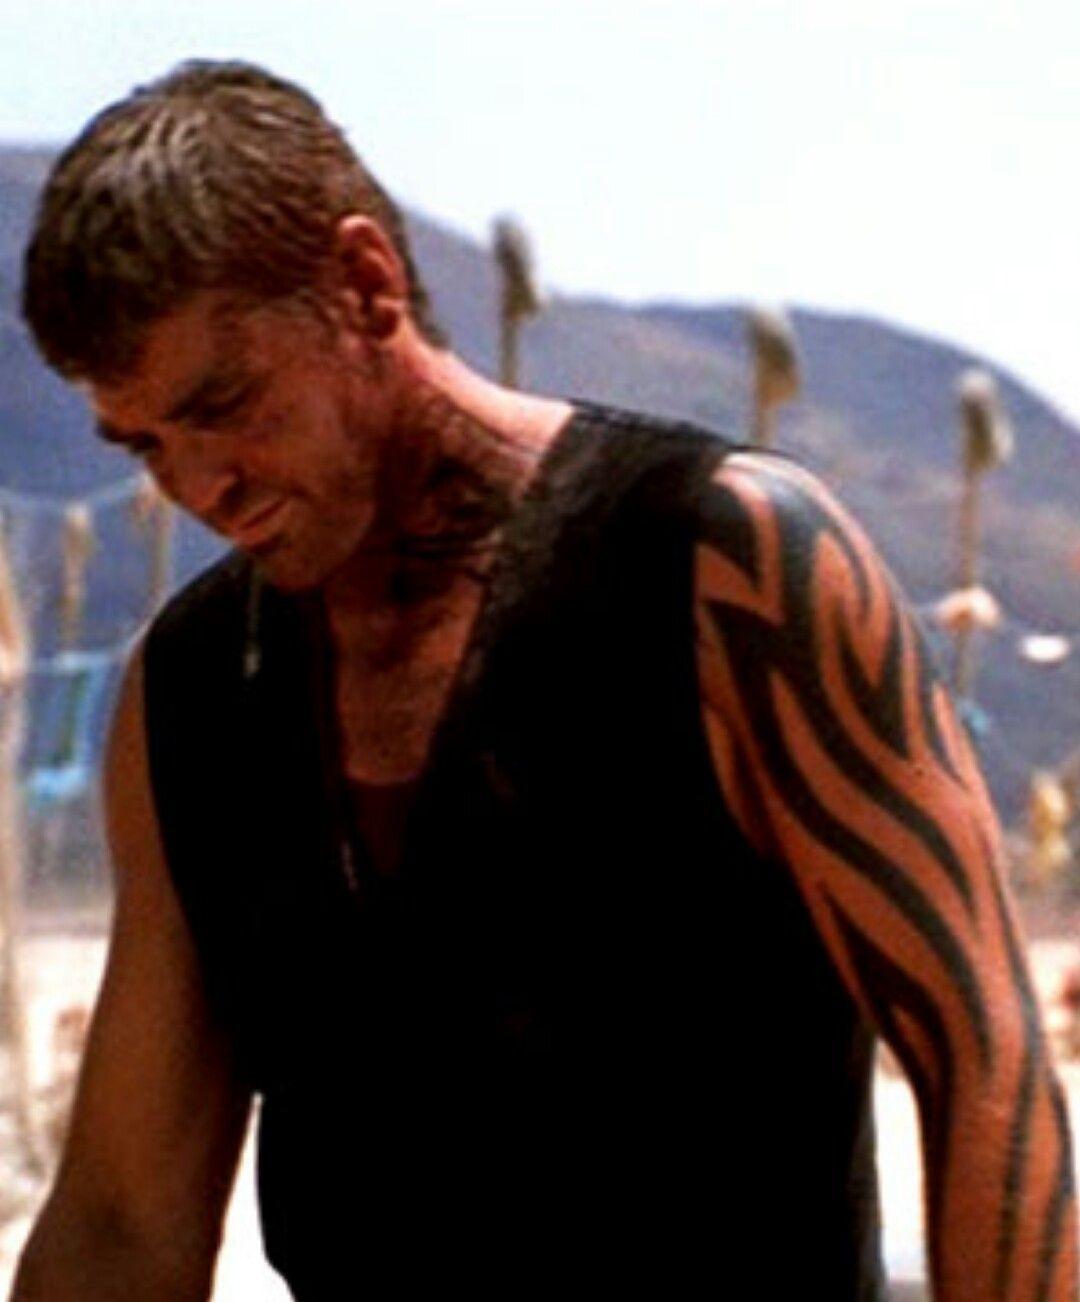 George Clooney Dusk Til Dawn Tattoo : george, clooney, tattoo, Gecko, Coolest, Movie, Tattoo, Ever,, Tattoos,, Dawn,